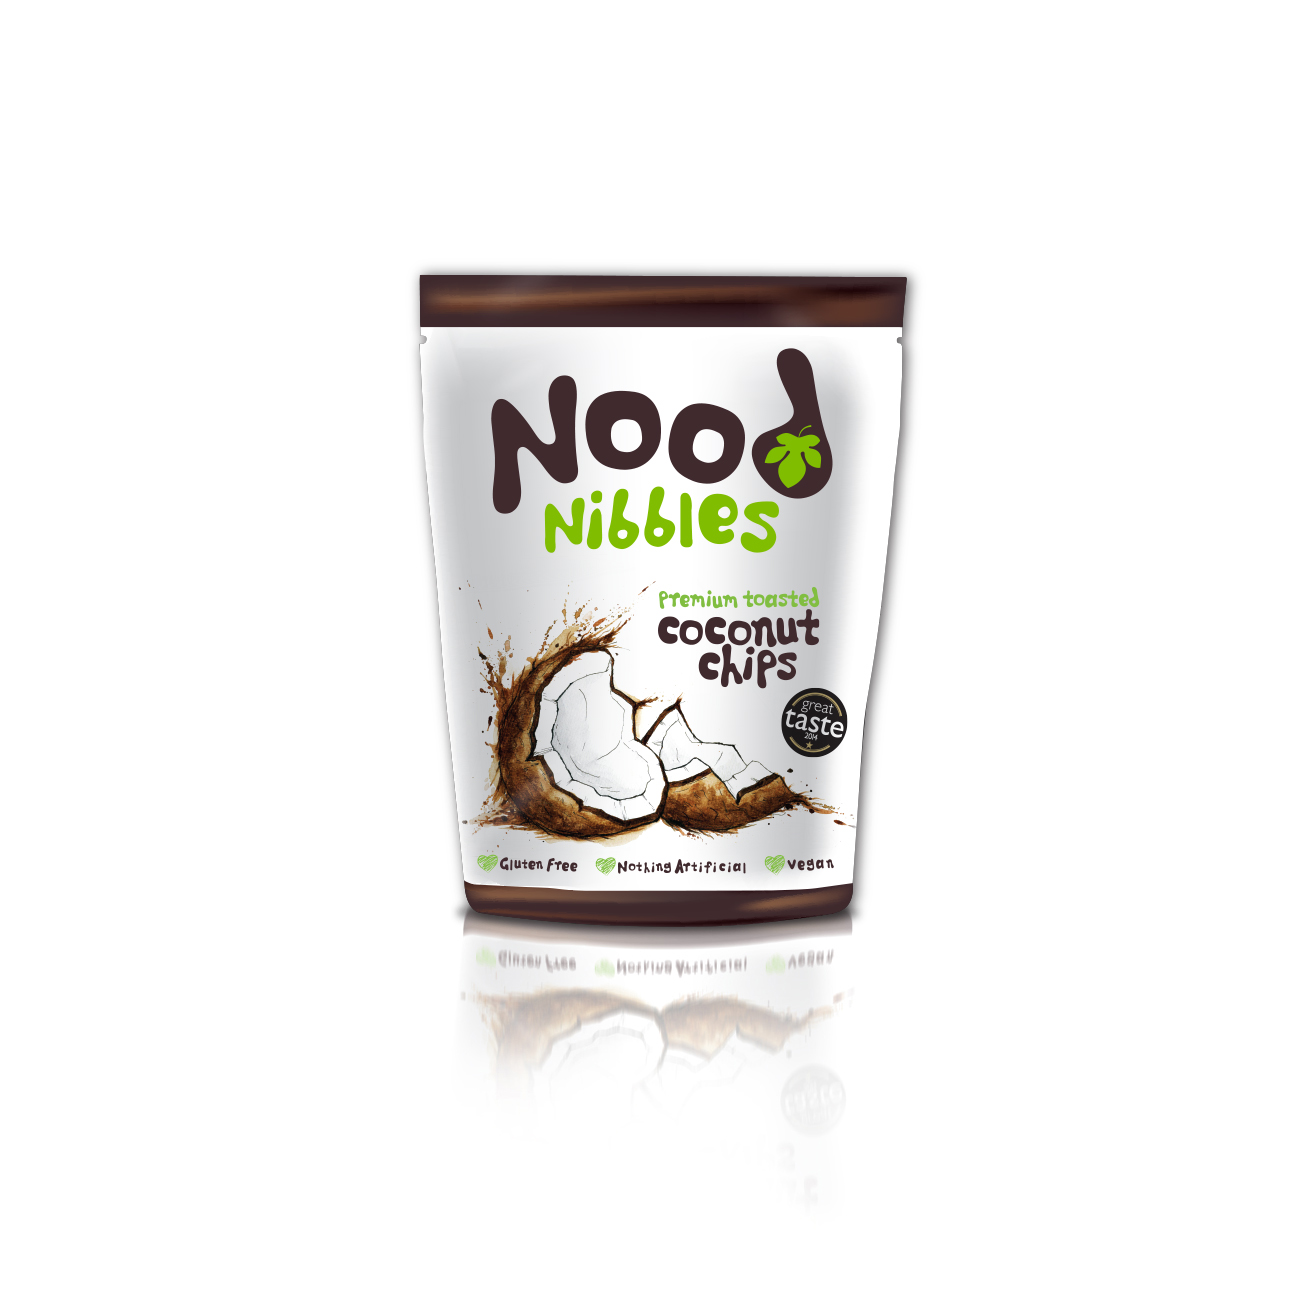 Nood_Coconut_chips.jpg